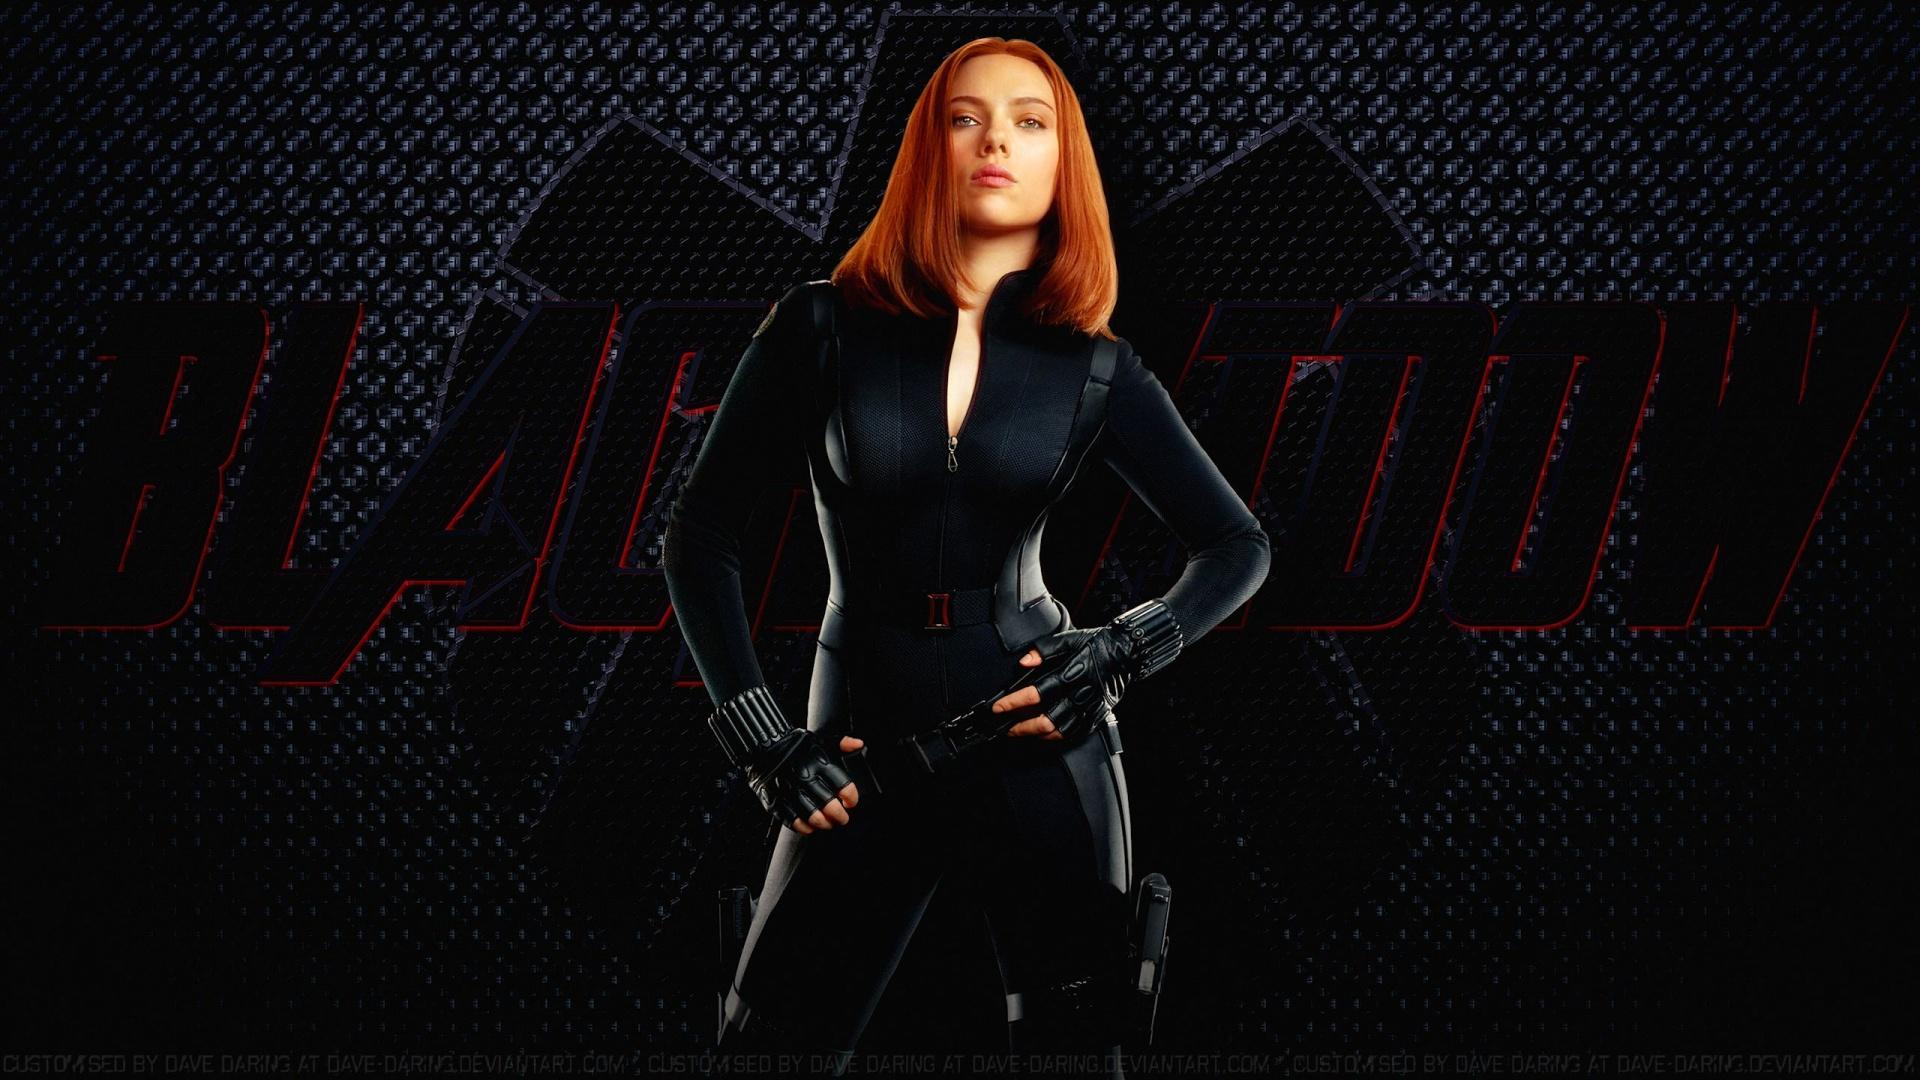 Black Widow cool background